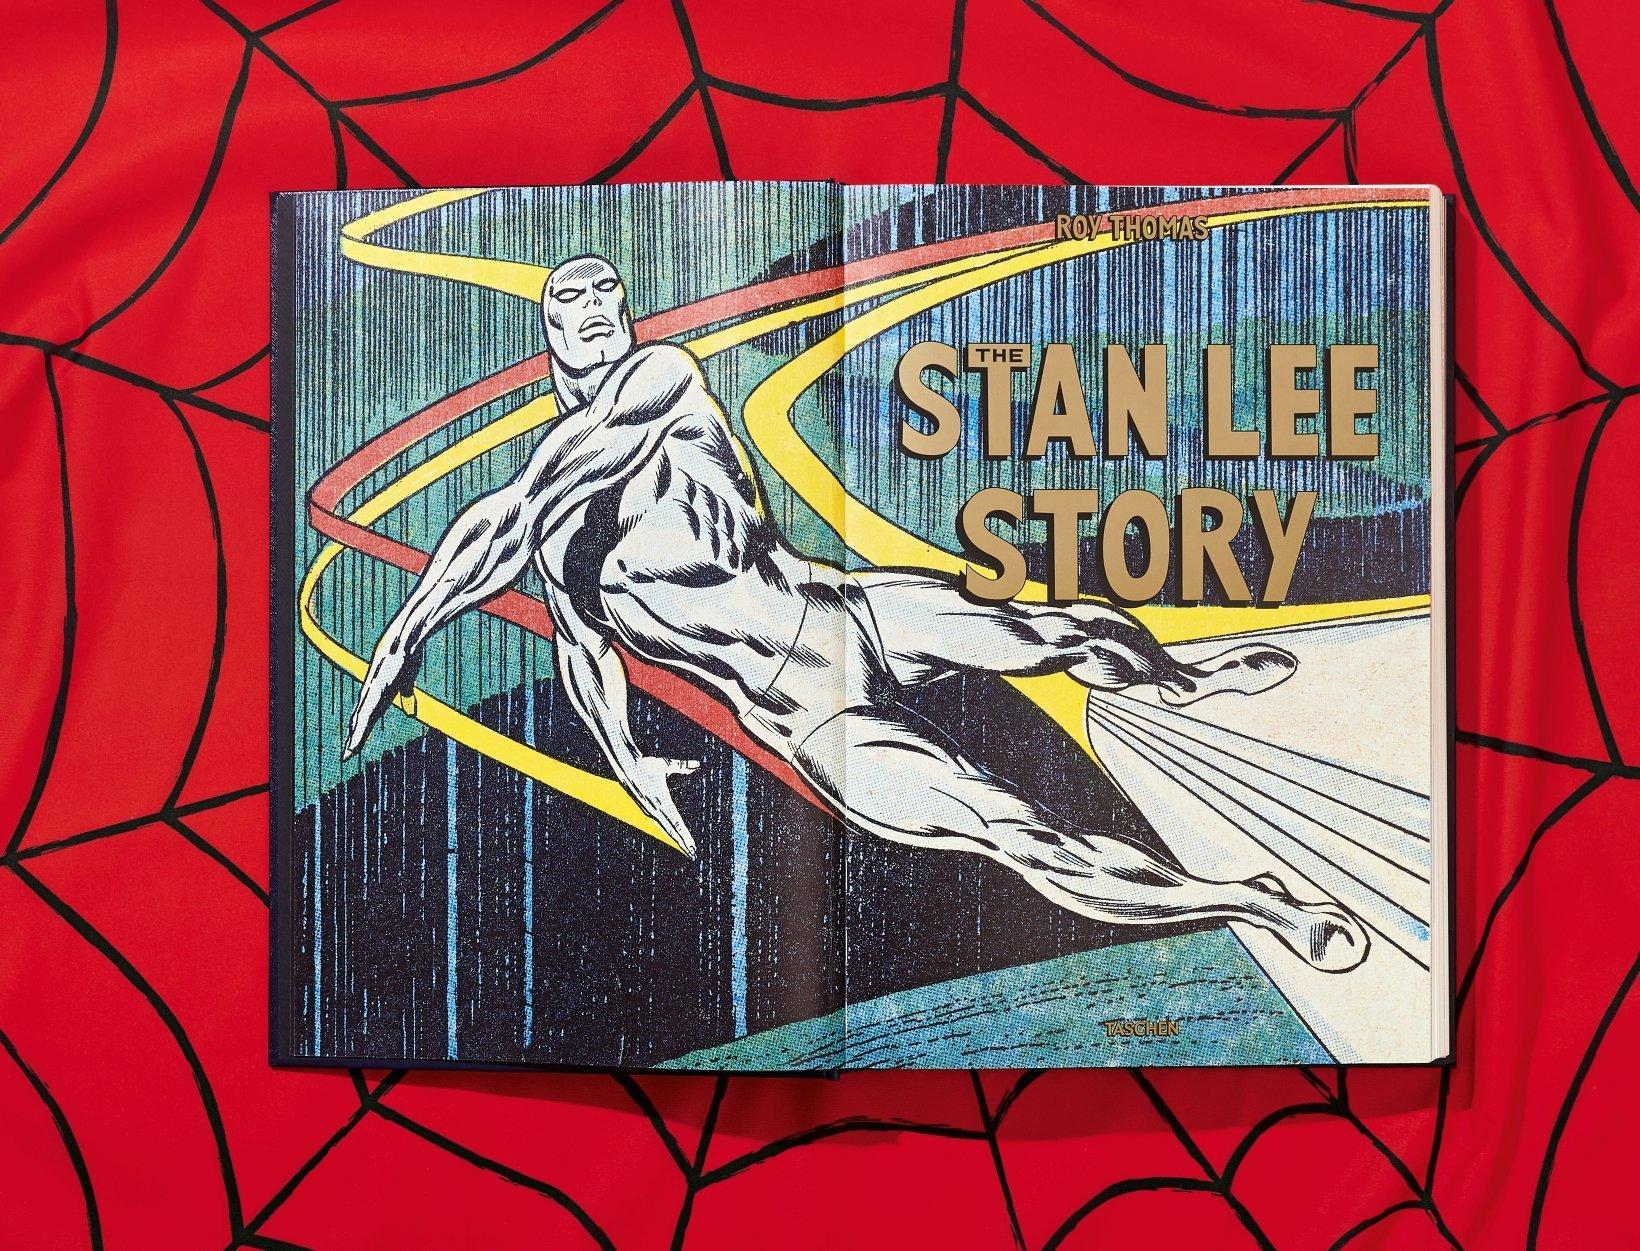 The Stan Lee Story à commander